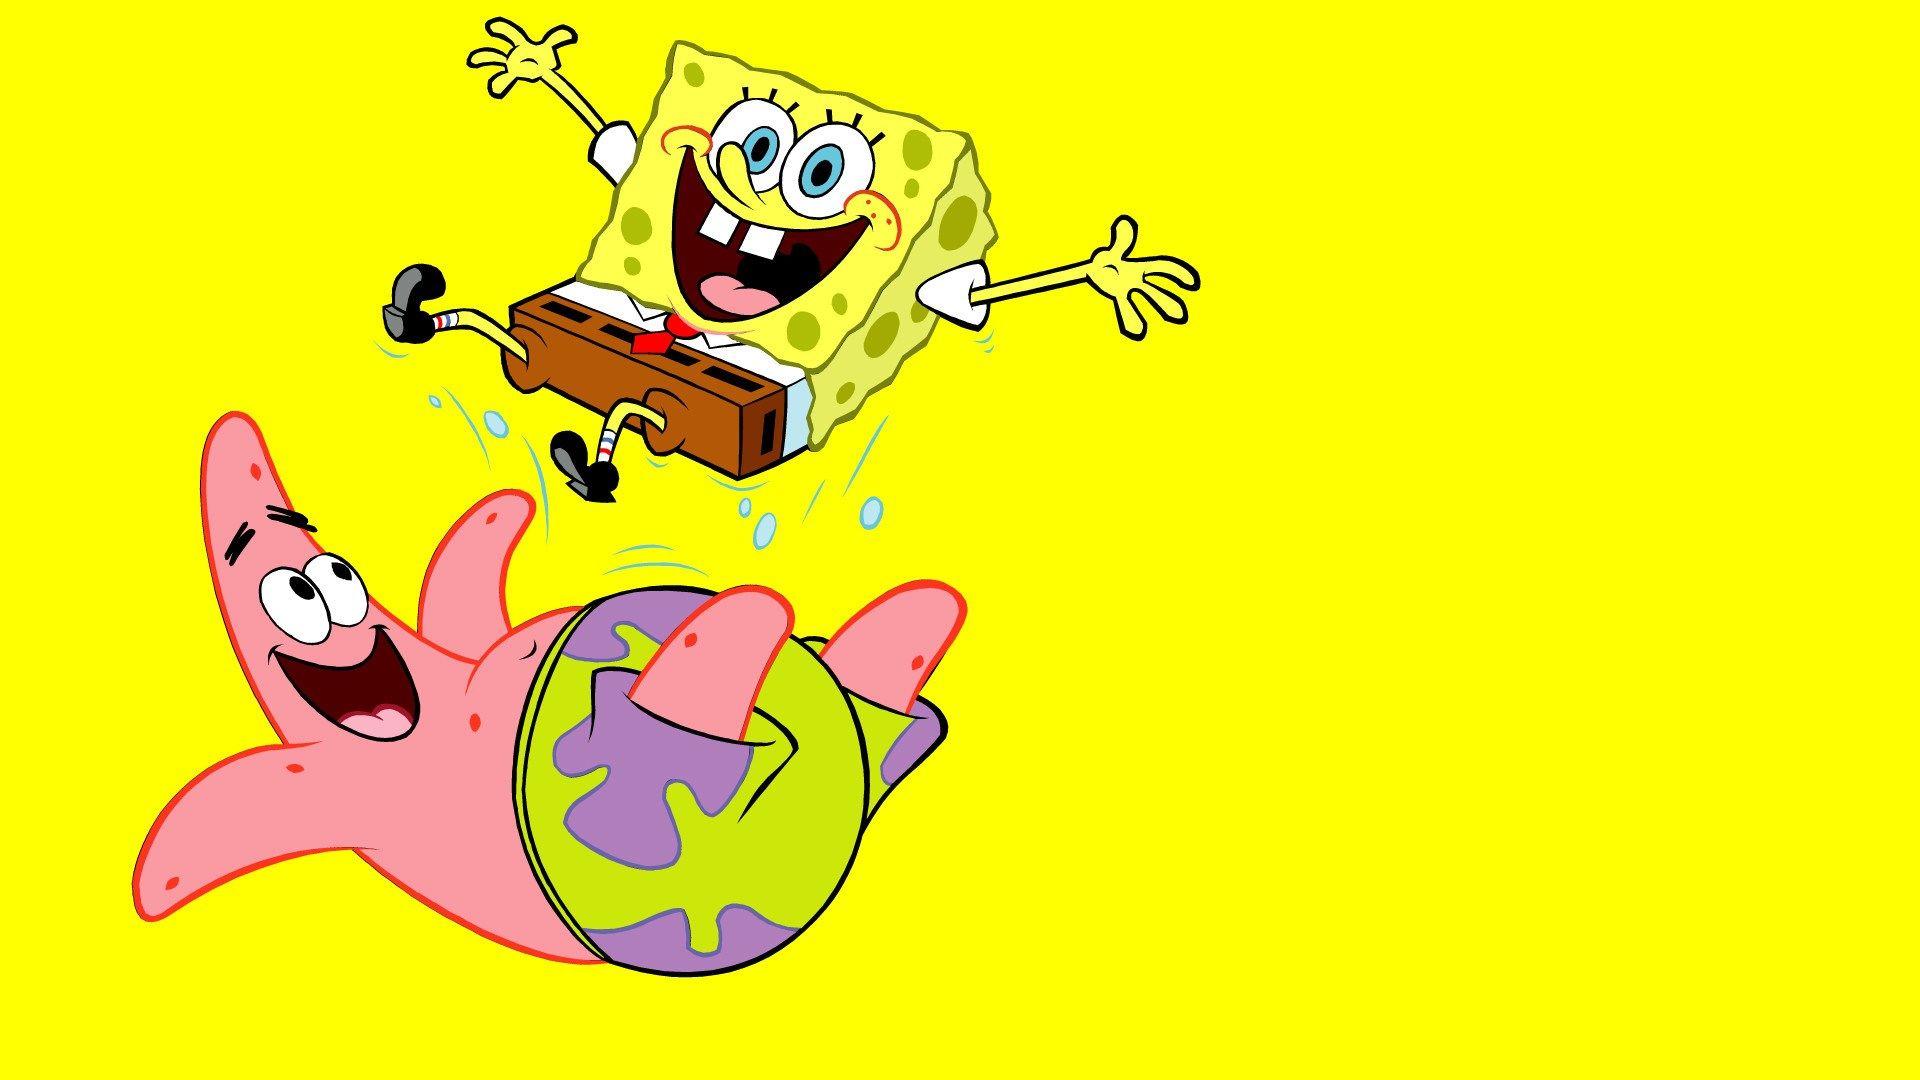 Spongebob Amp Patrick 3840 X 2160 Wallpaper Spongebob Wallpaper Hd Iphone Kartun